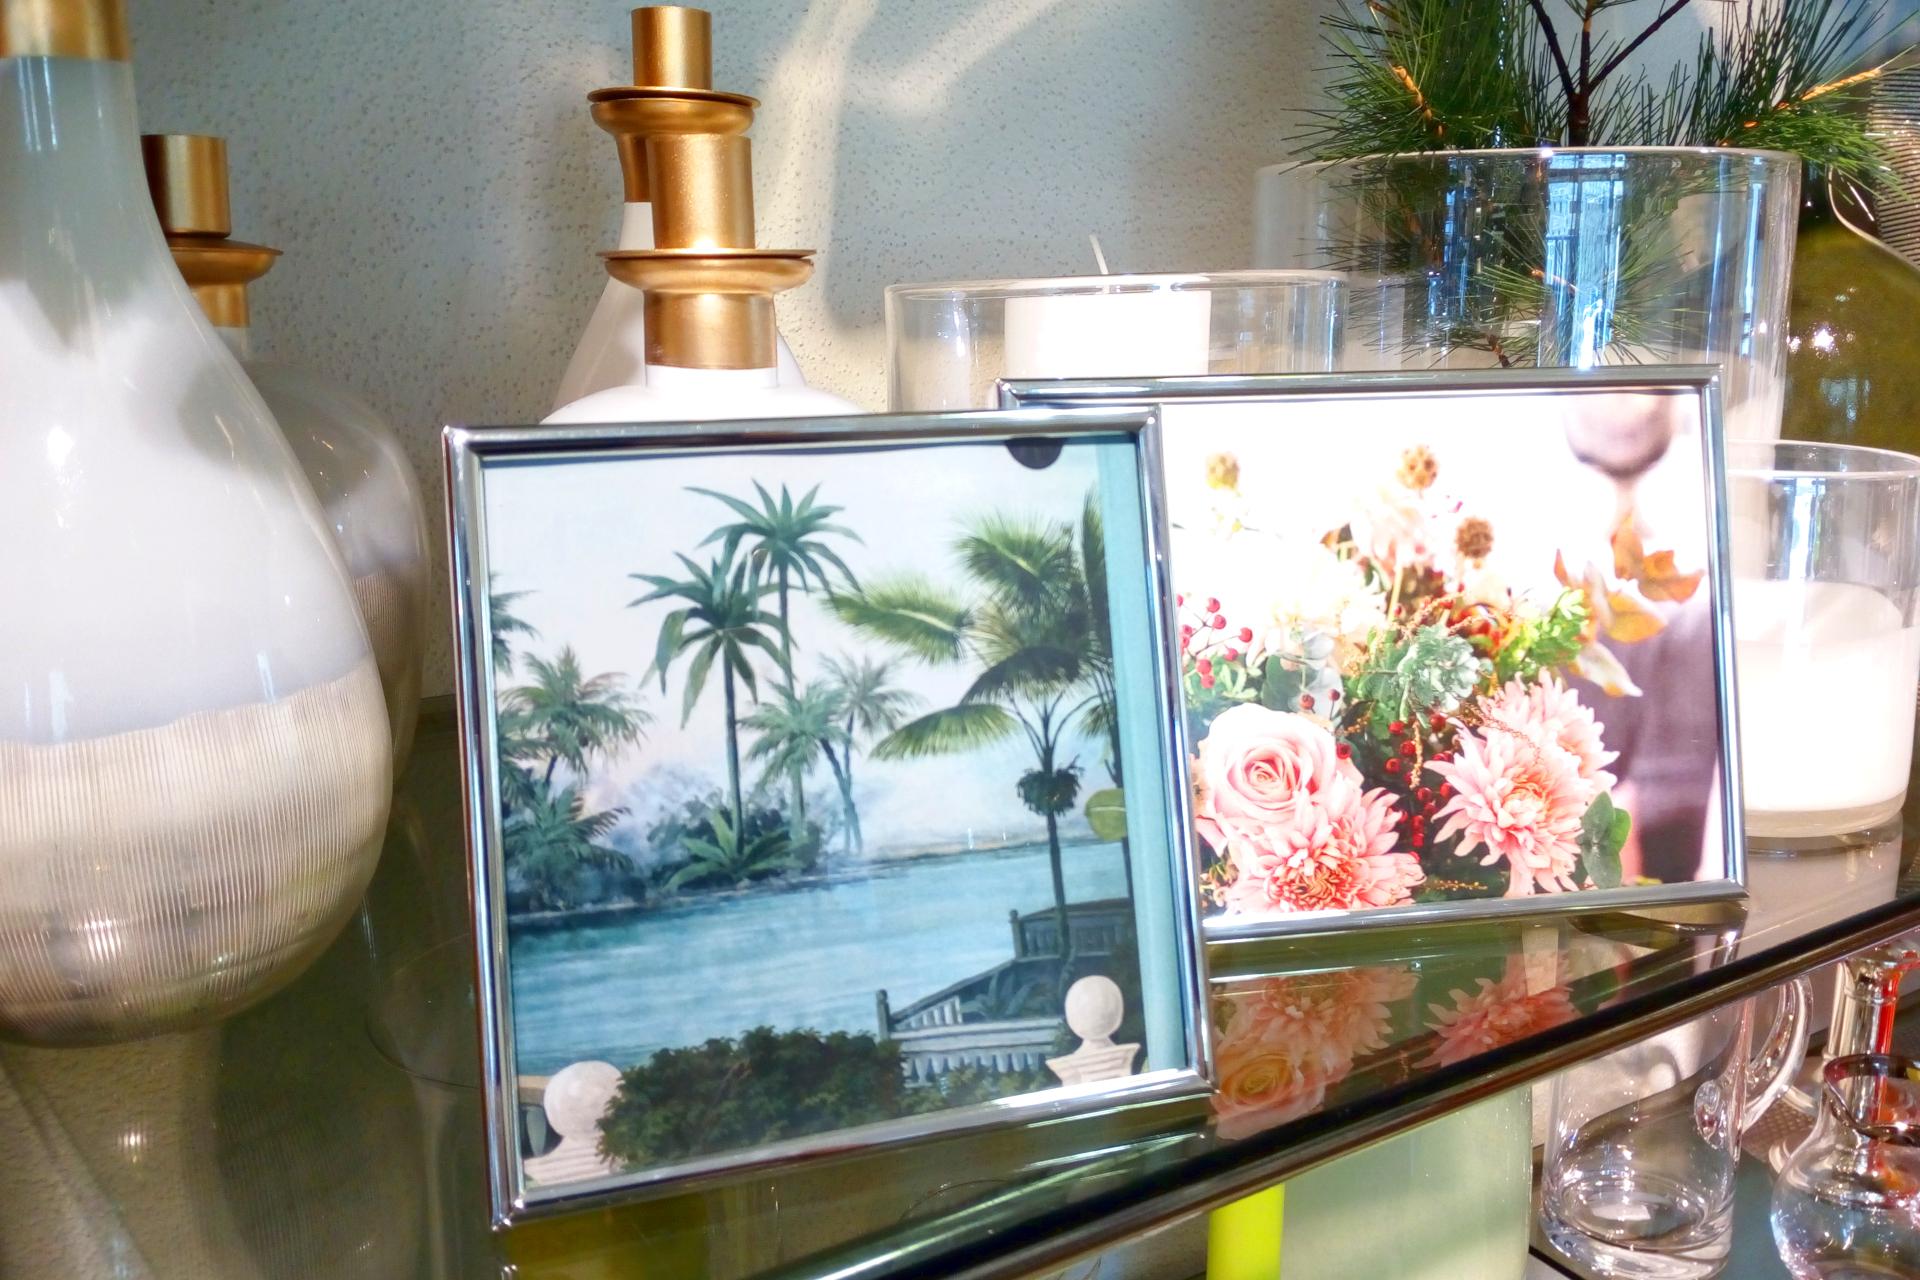 Wohnstudio Dekoration Geschenkideen Bilderrahmen Vasen Blumen Glas